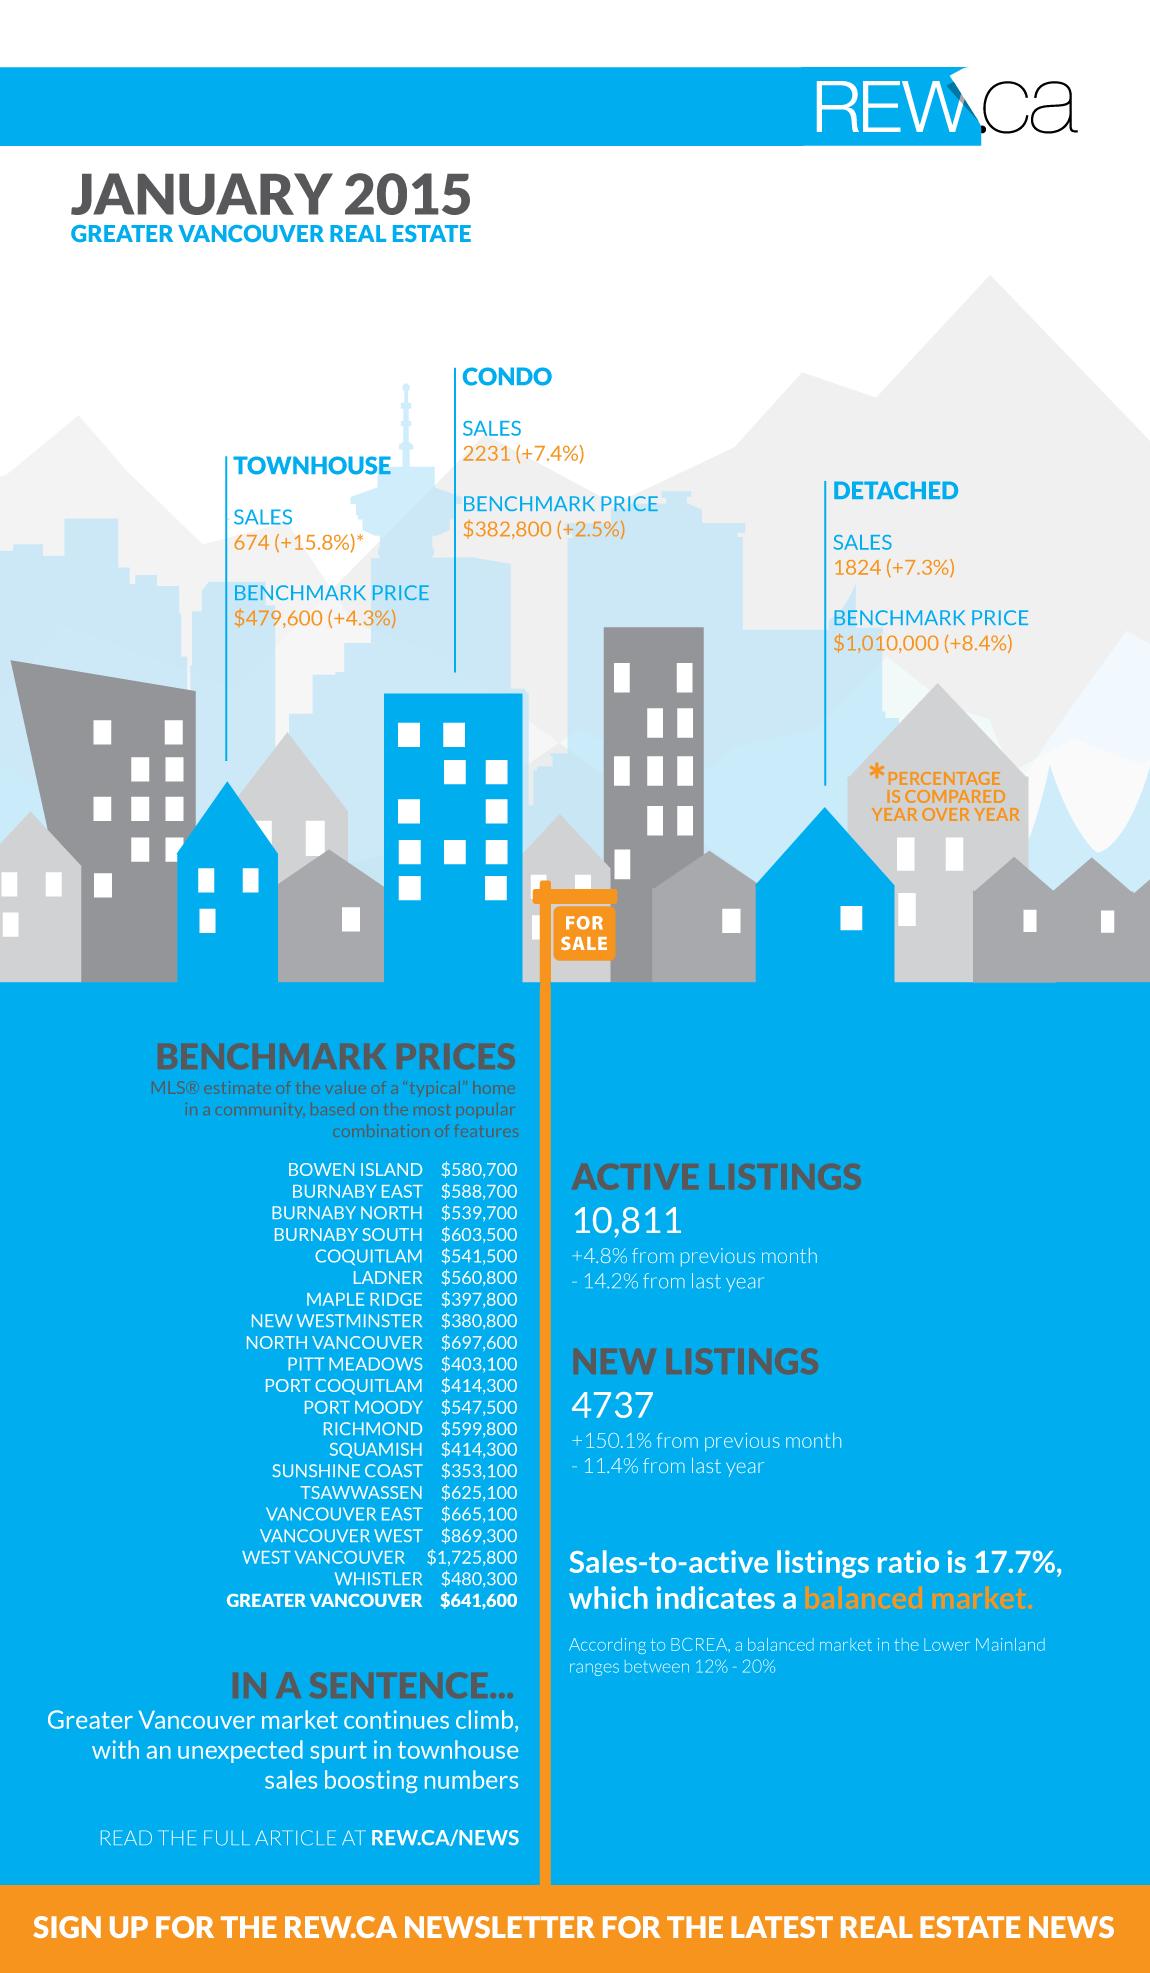 rebgv jan 2015 infographic